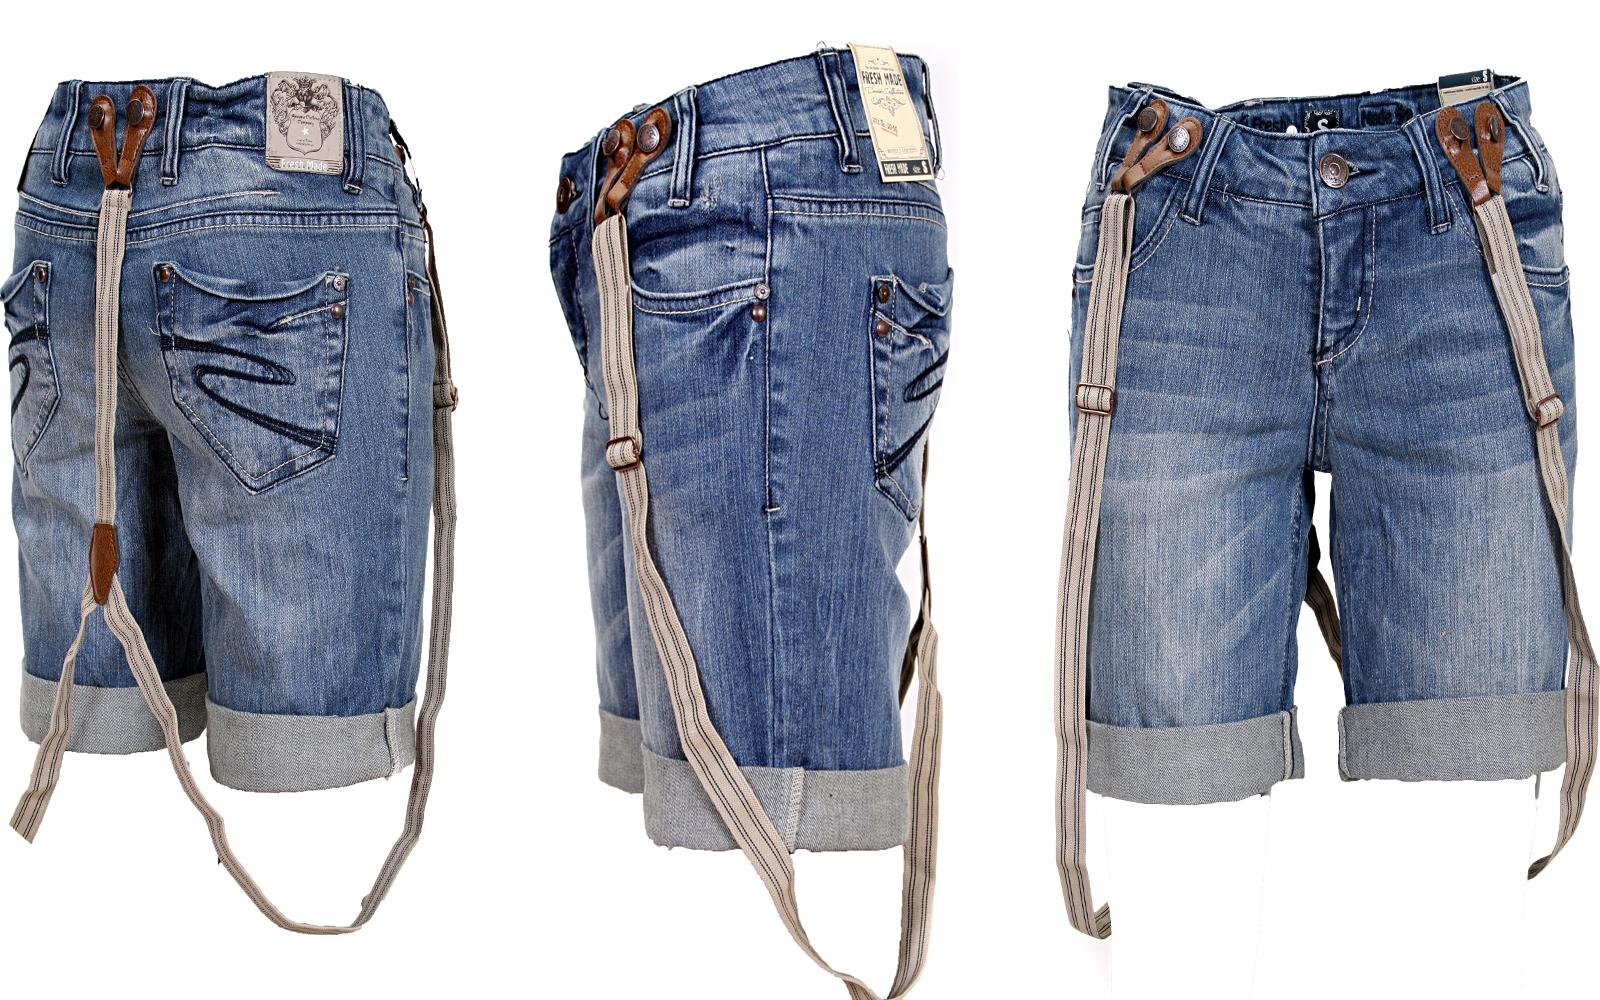 neu sexy damen shorts jeans short bermuda tr ger middle blue denim xs s m l xl ebay. Black Bedroom Furniture Sets. Home Design Ideas